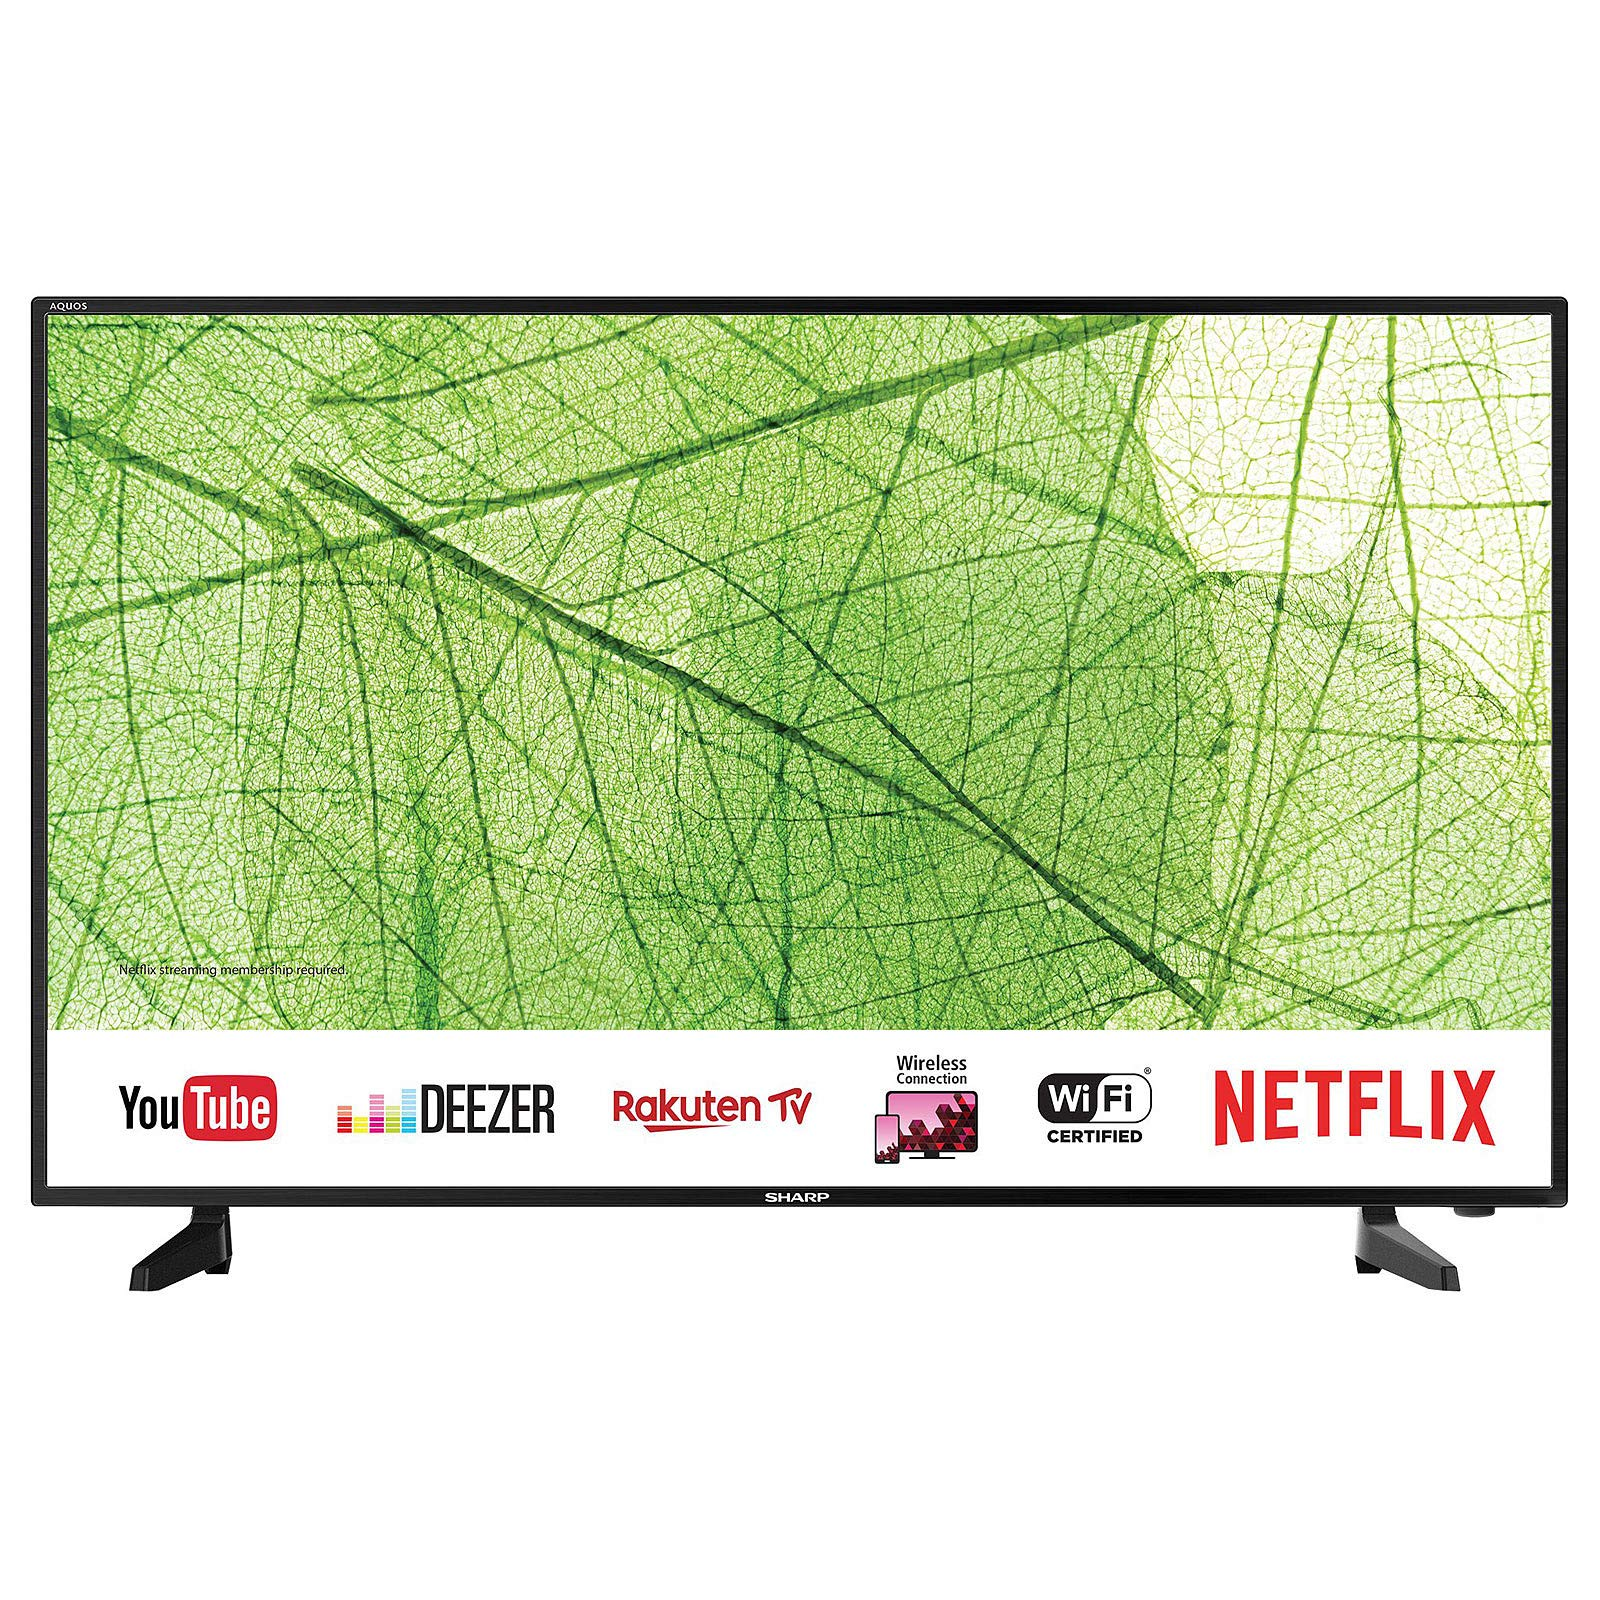 Sharp 40AJ2E, Smart TV LED 4K Ultra HD (Altavoces Harman/Kardon, WiFi, HD Tuner), Wireless/Ethernet/HDMI/Inalámbrico/USB, 40